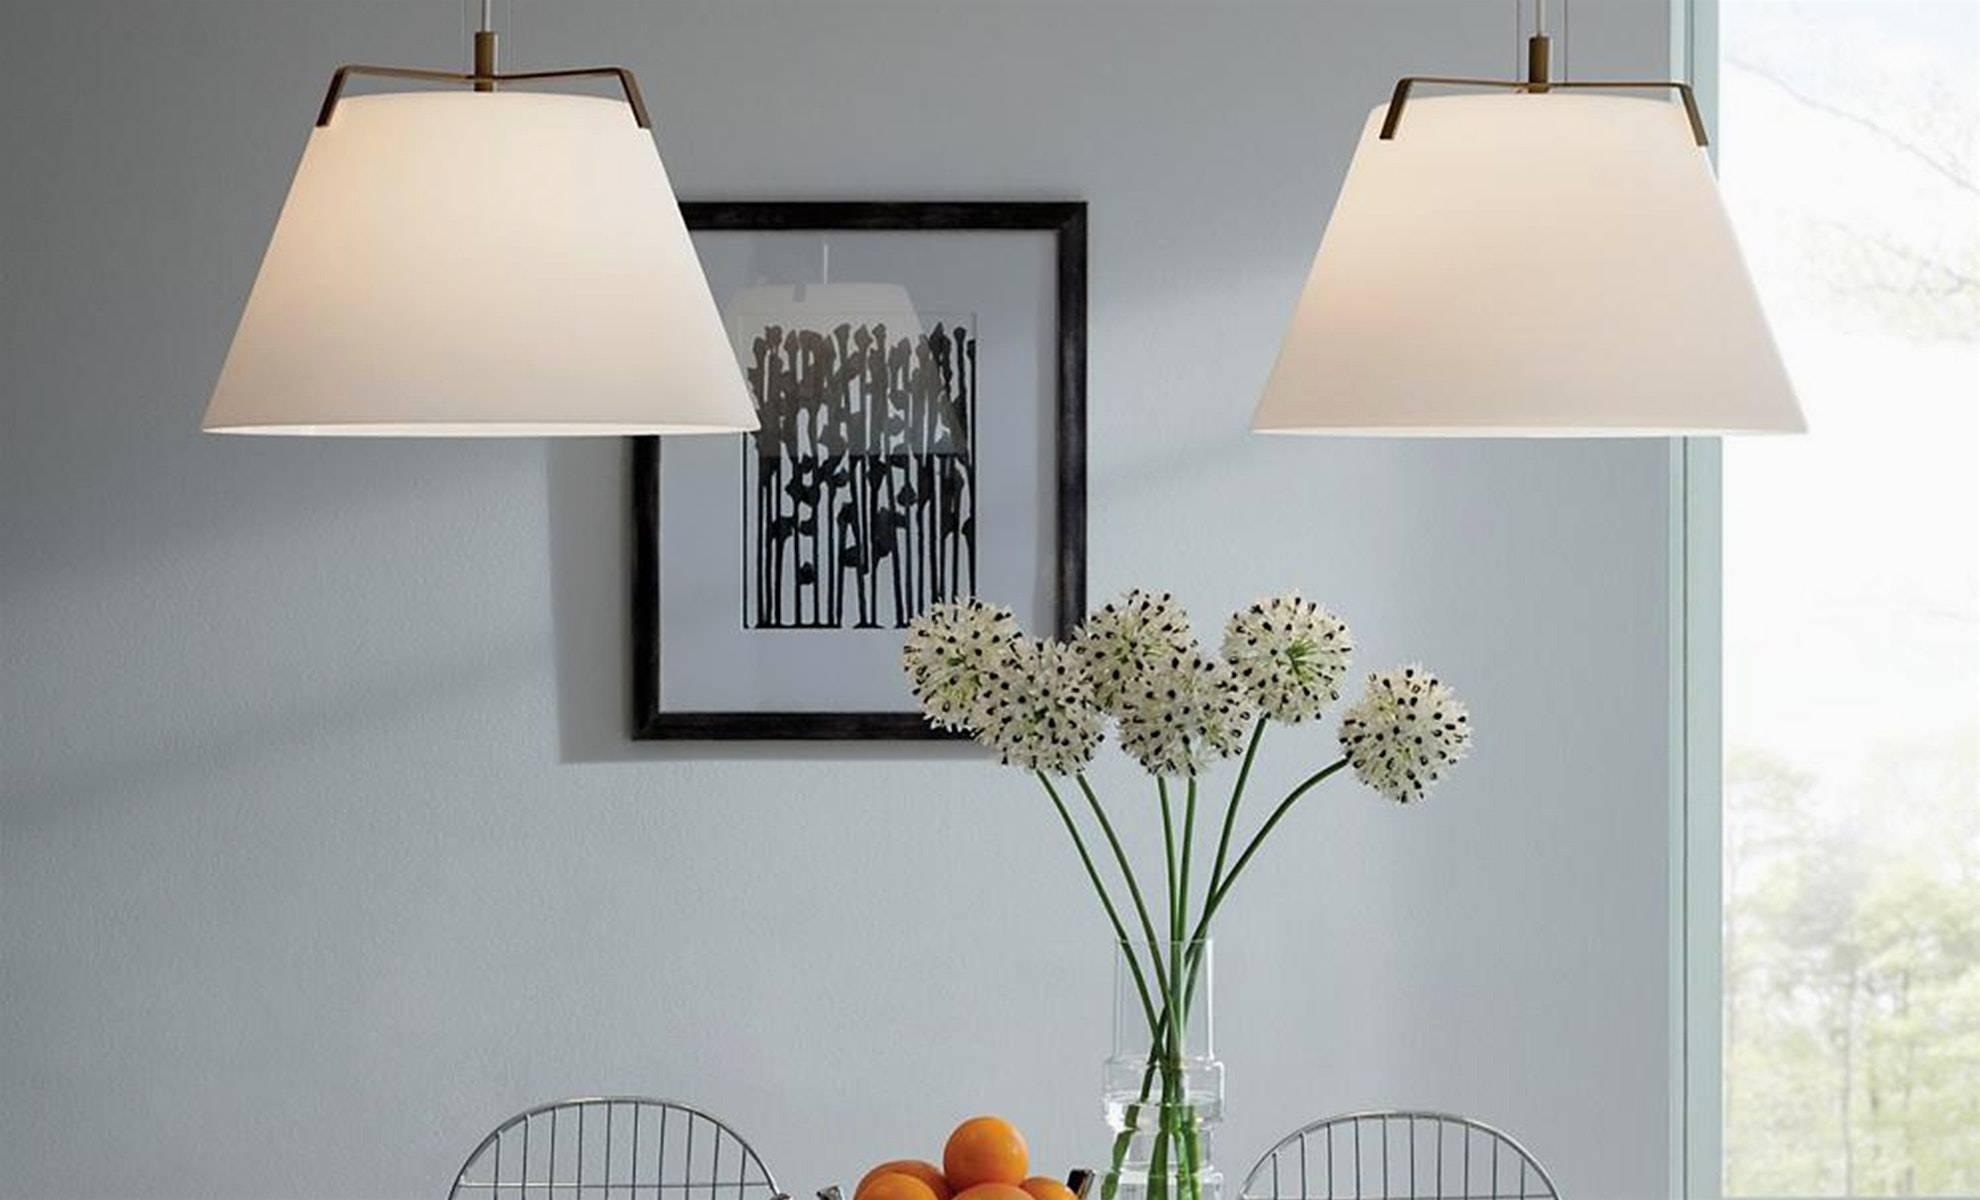 Clearance Pendant Light Ideas Regarding Clearance Pendant Lighting (View 3 of 15)